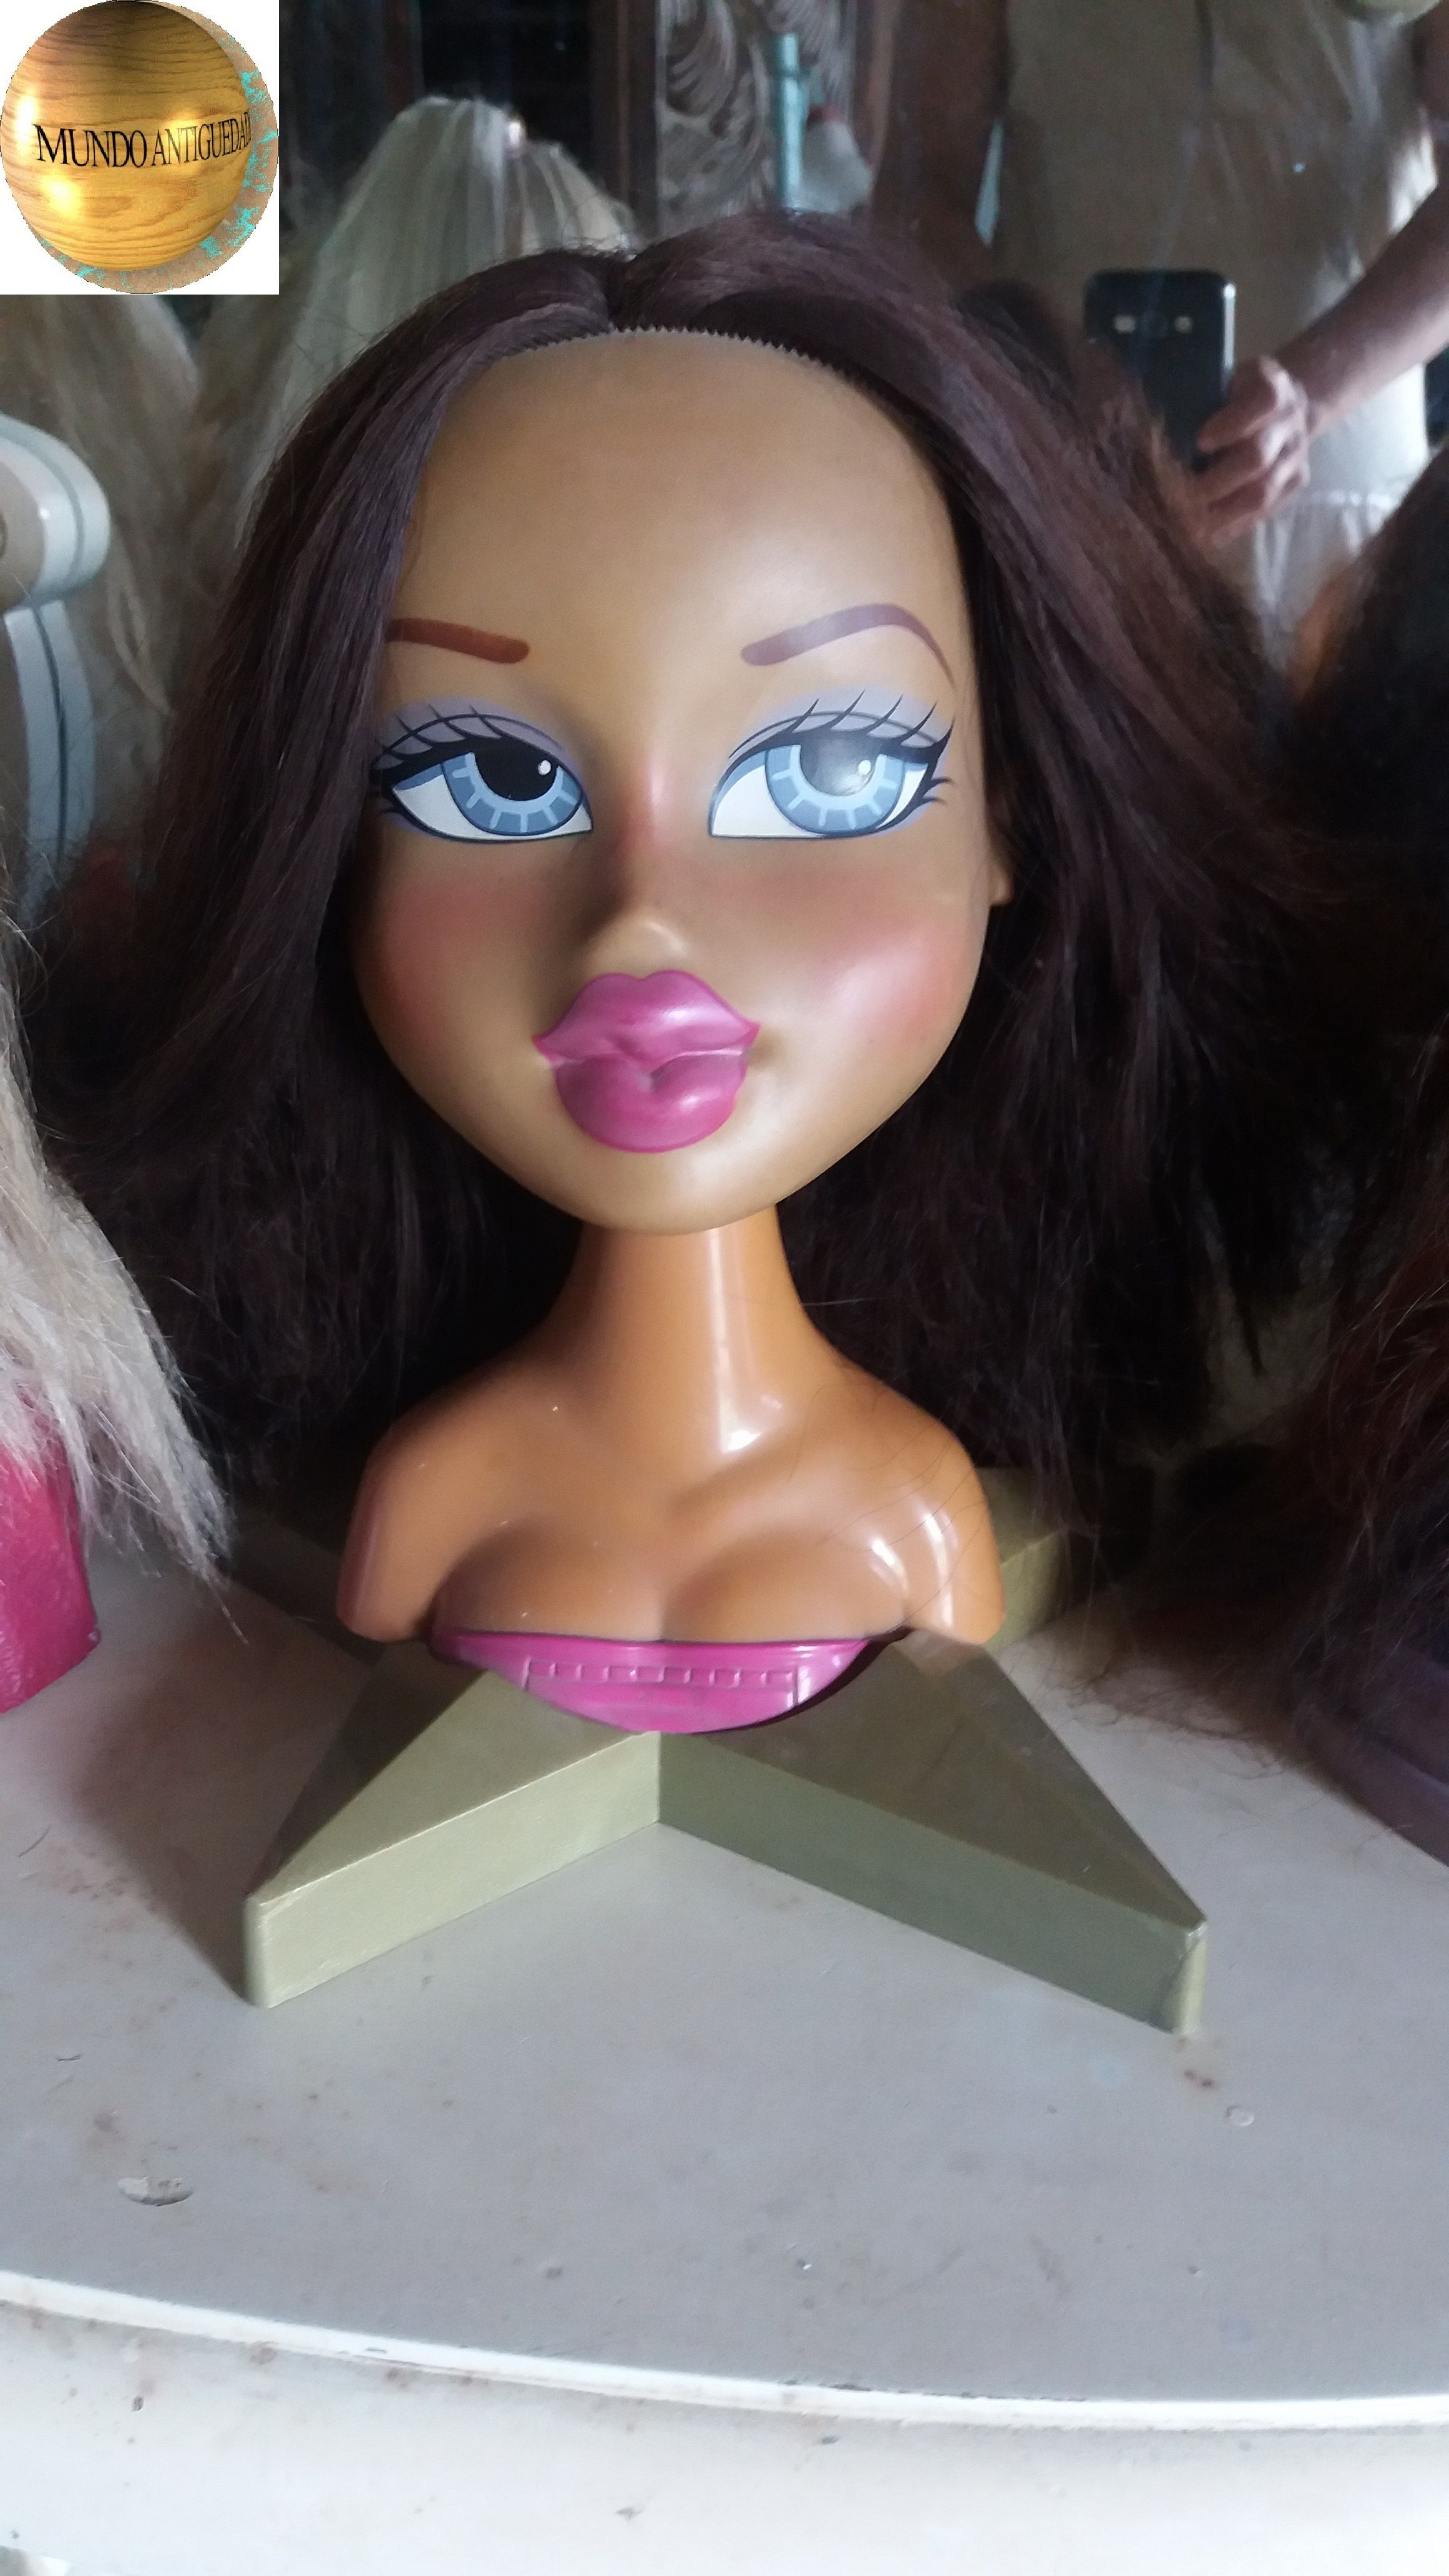 Muñeca Barbie cabeza para peinar y maquillar,Bratz | Muñeca Barbie ...